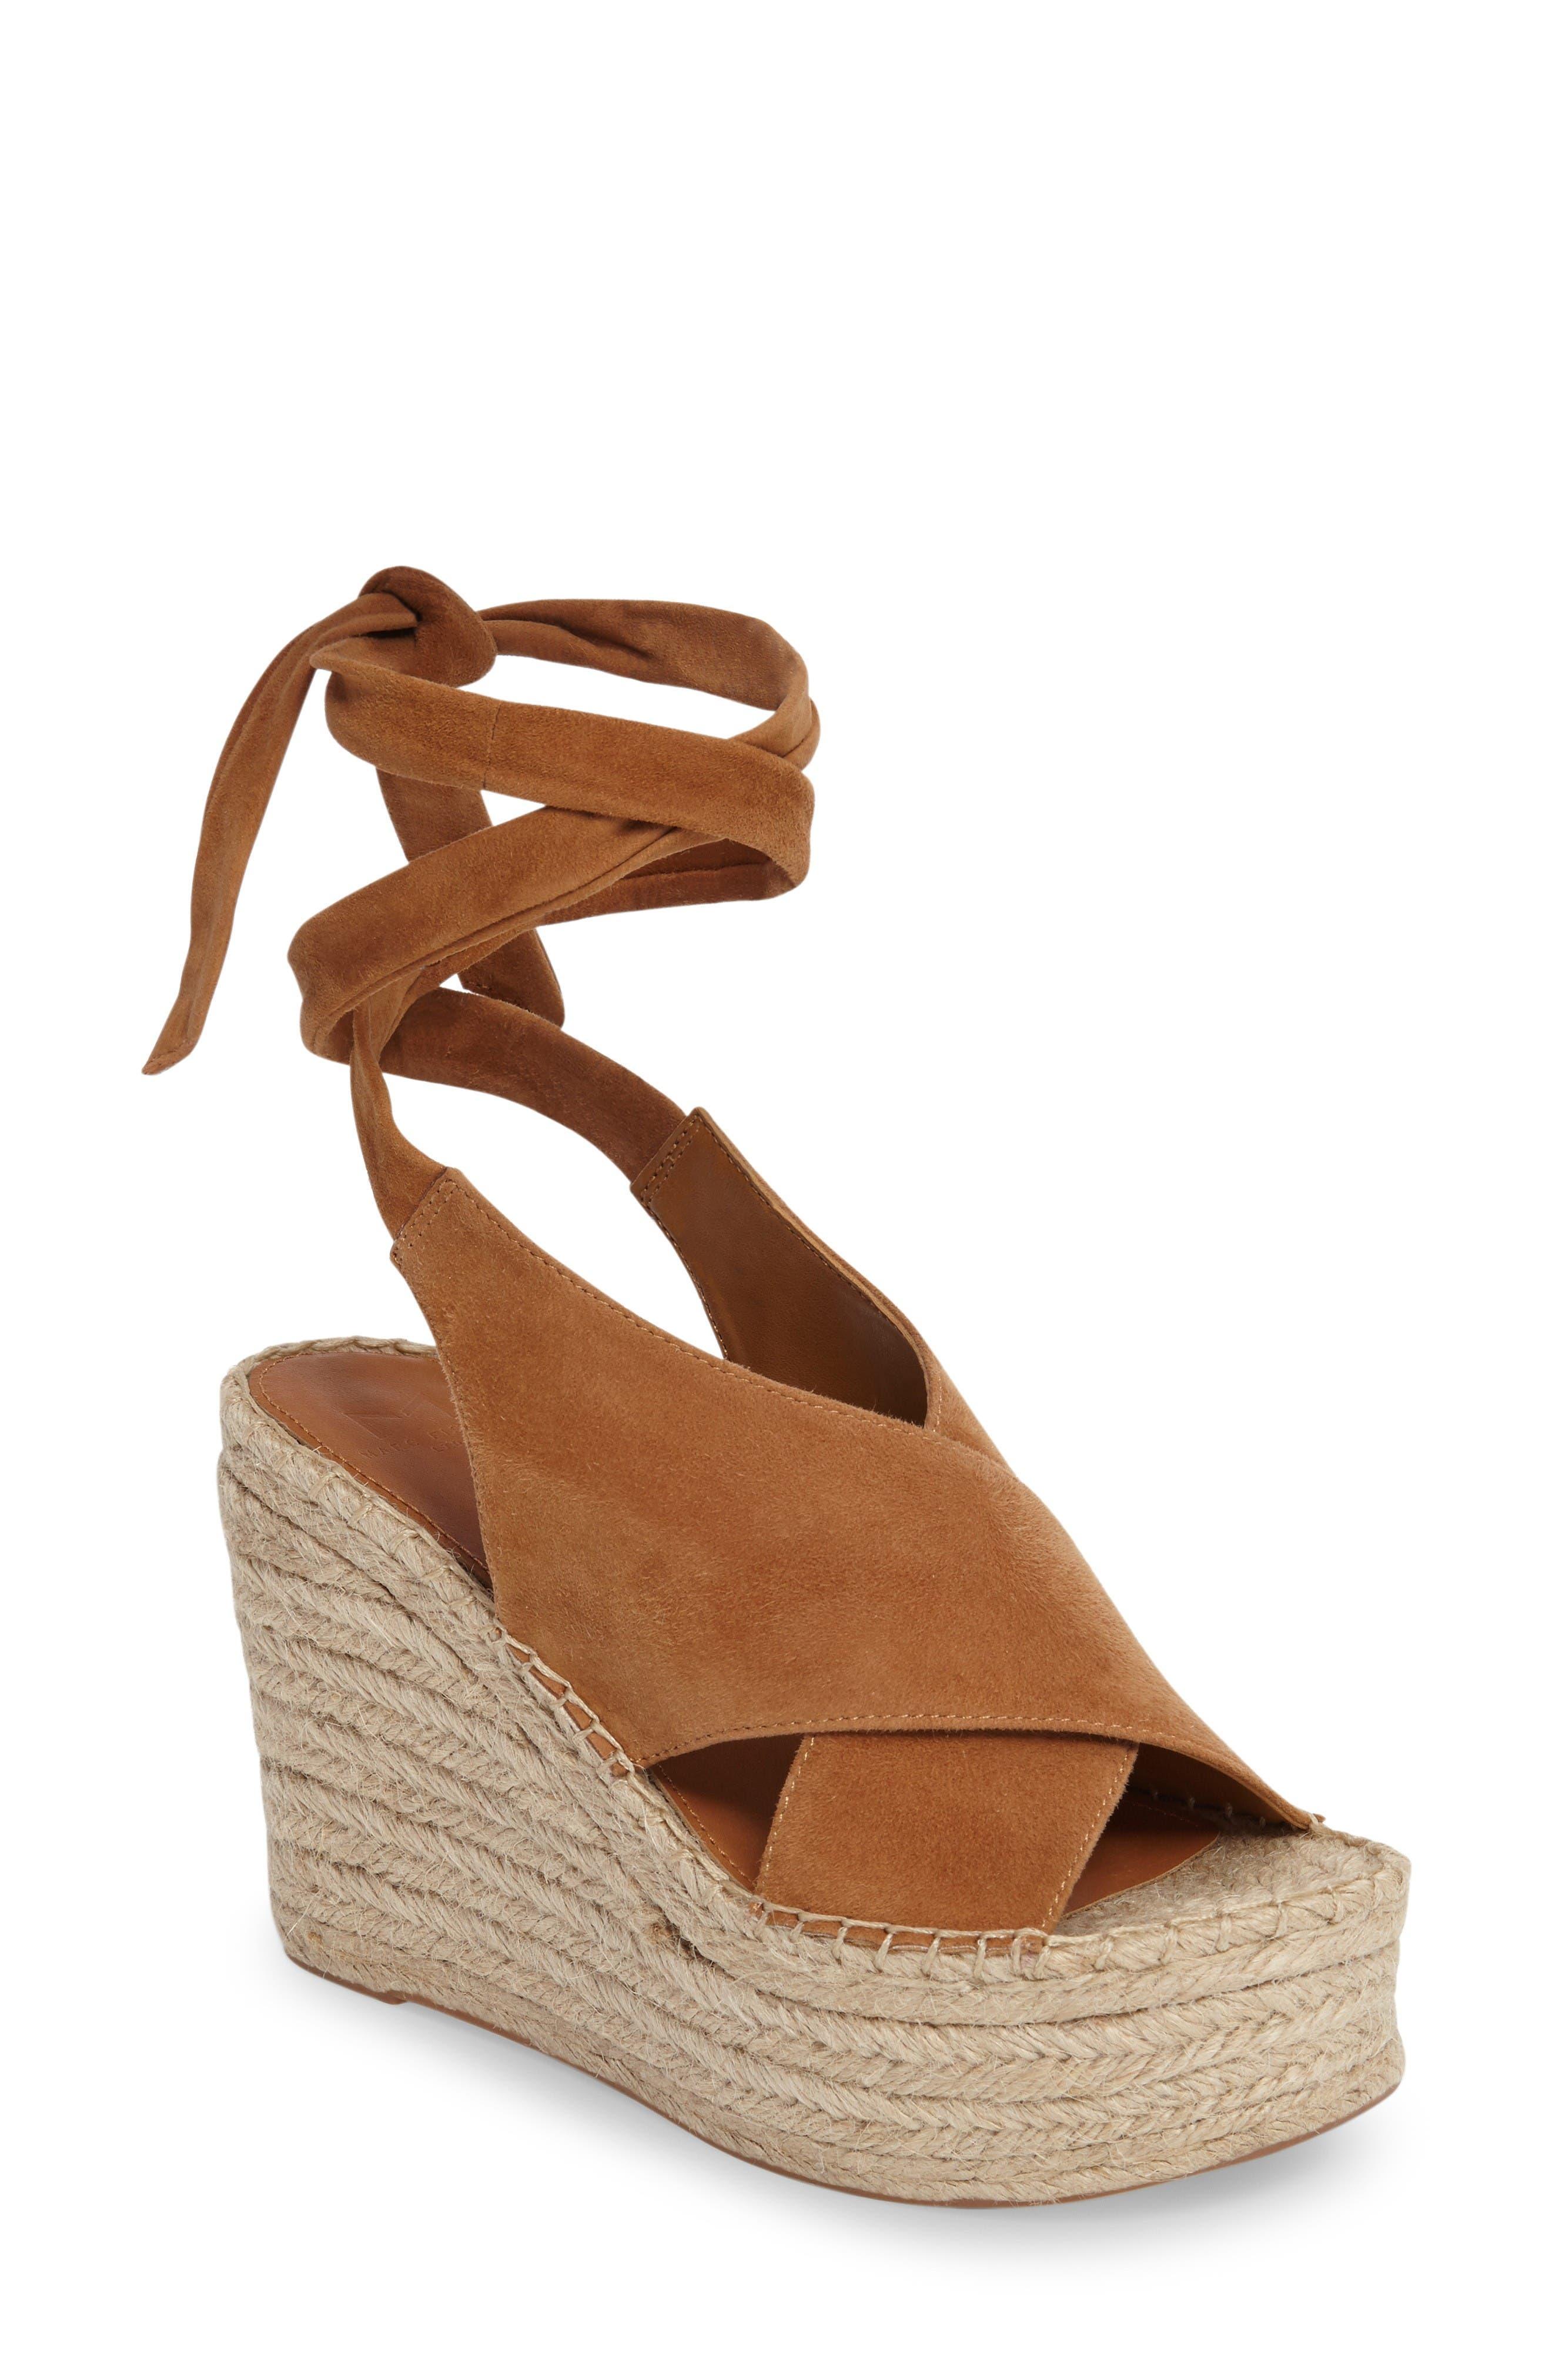 Main Image - Marc Fisher LTD Andira Platform Wedge Sandal (Women)